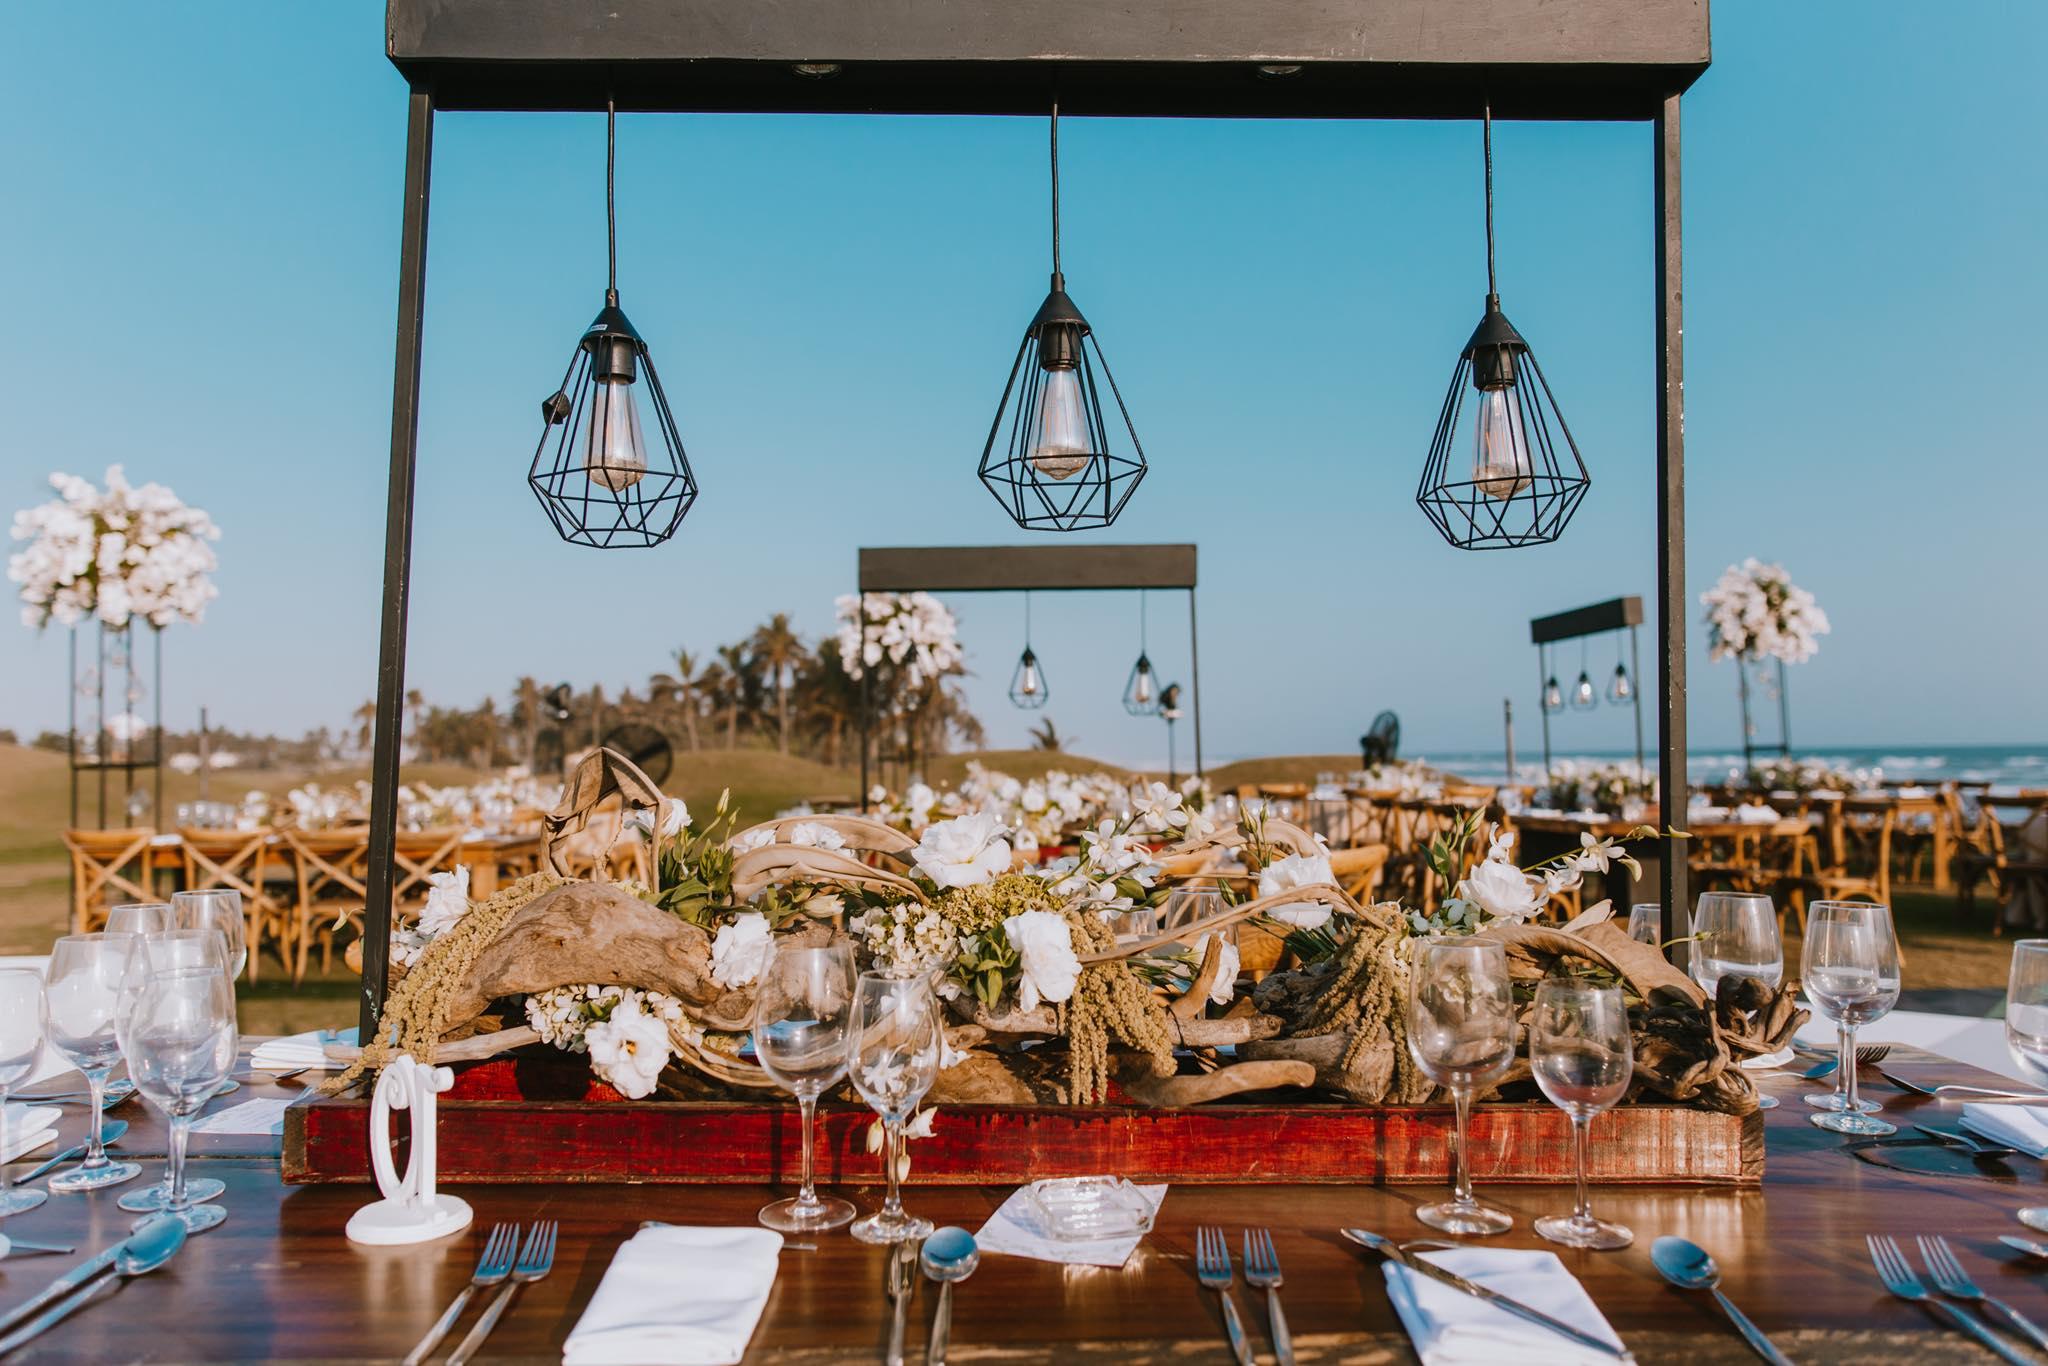 Event Flow by Evelyn Paz, Wedding planners en México - Wedding Hub - 08